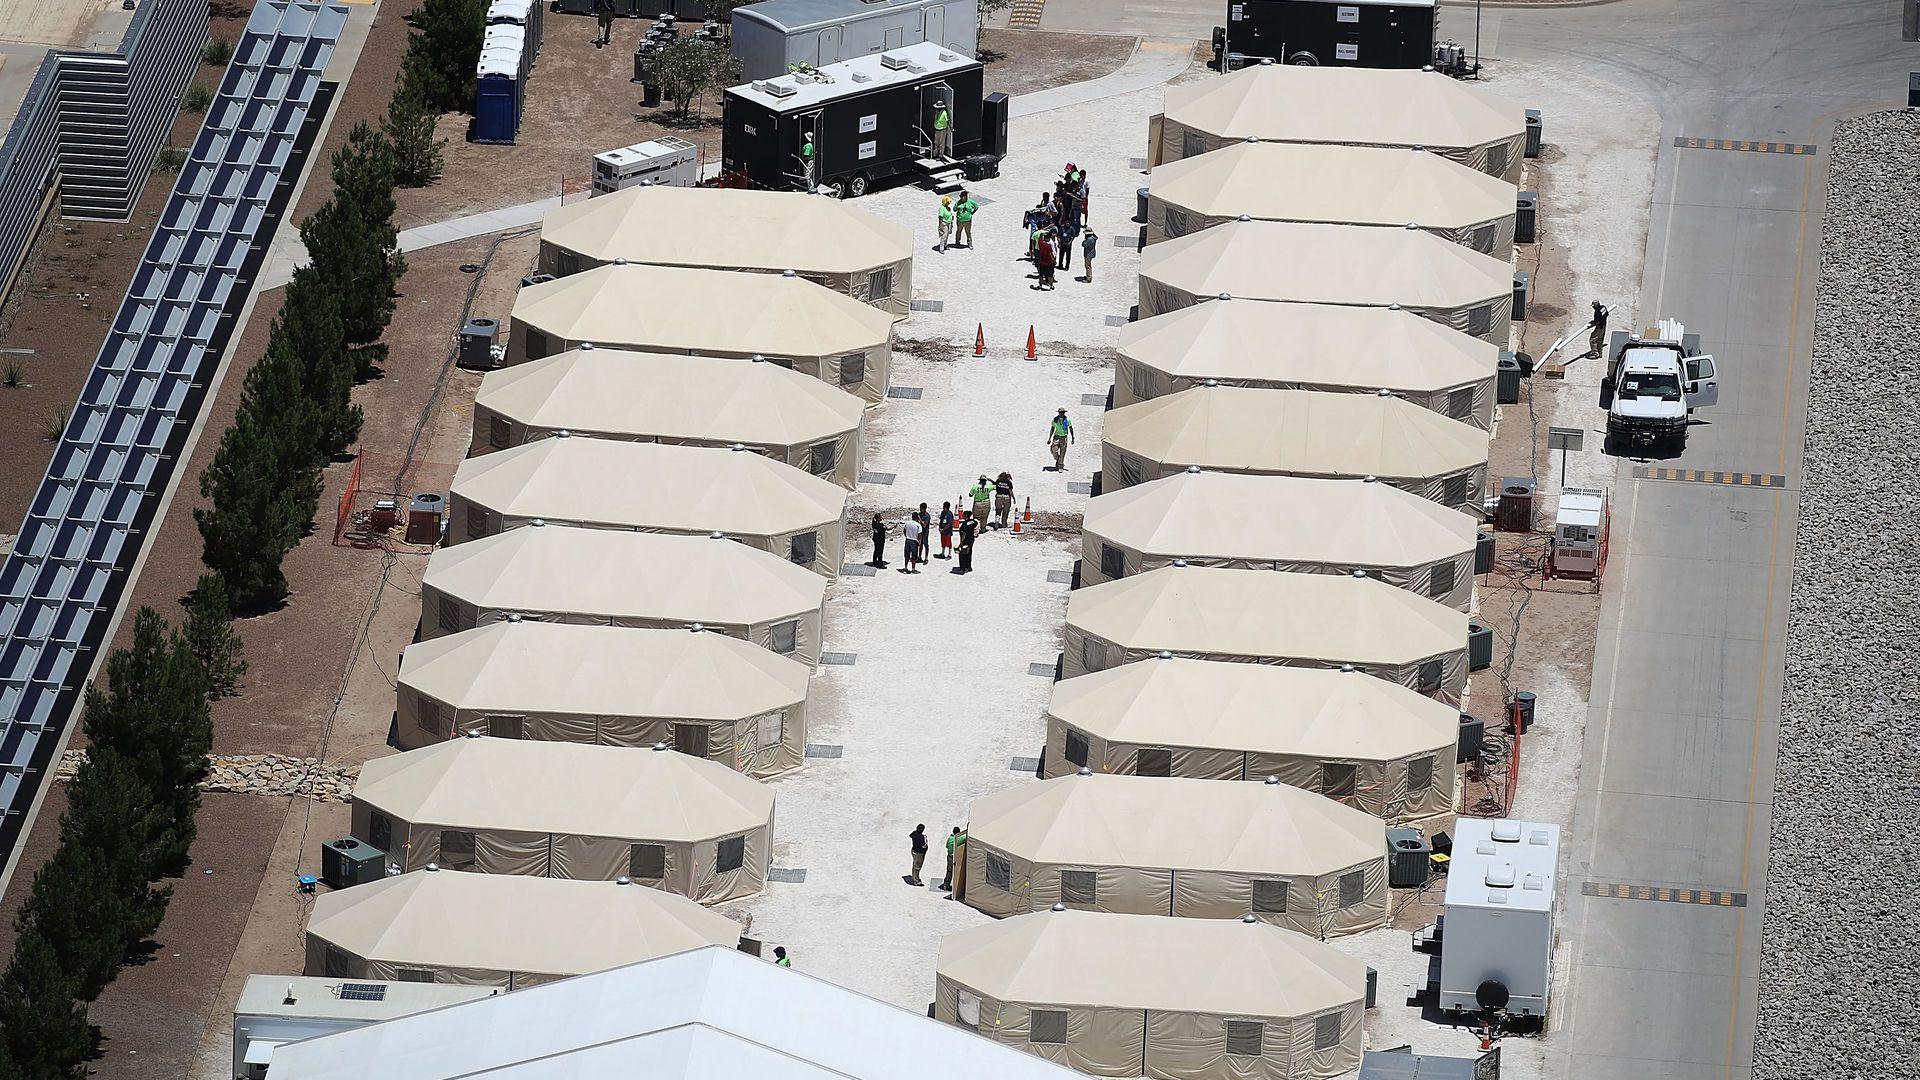 Tent encampment for immigrant children